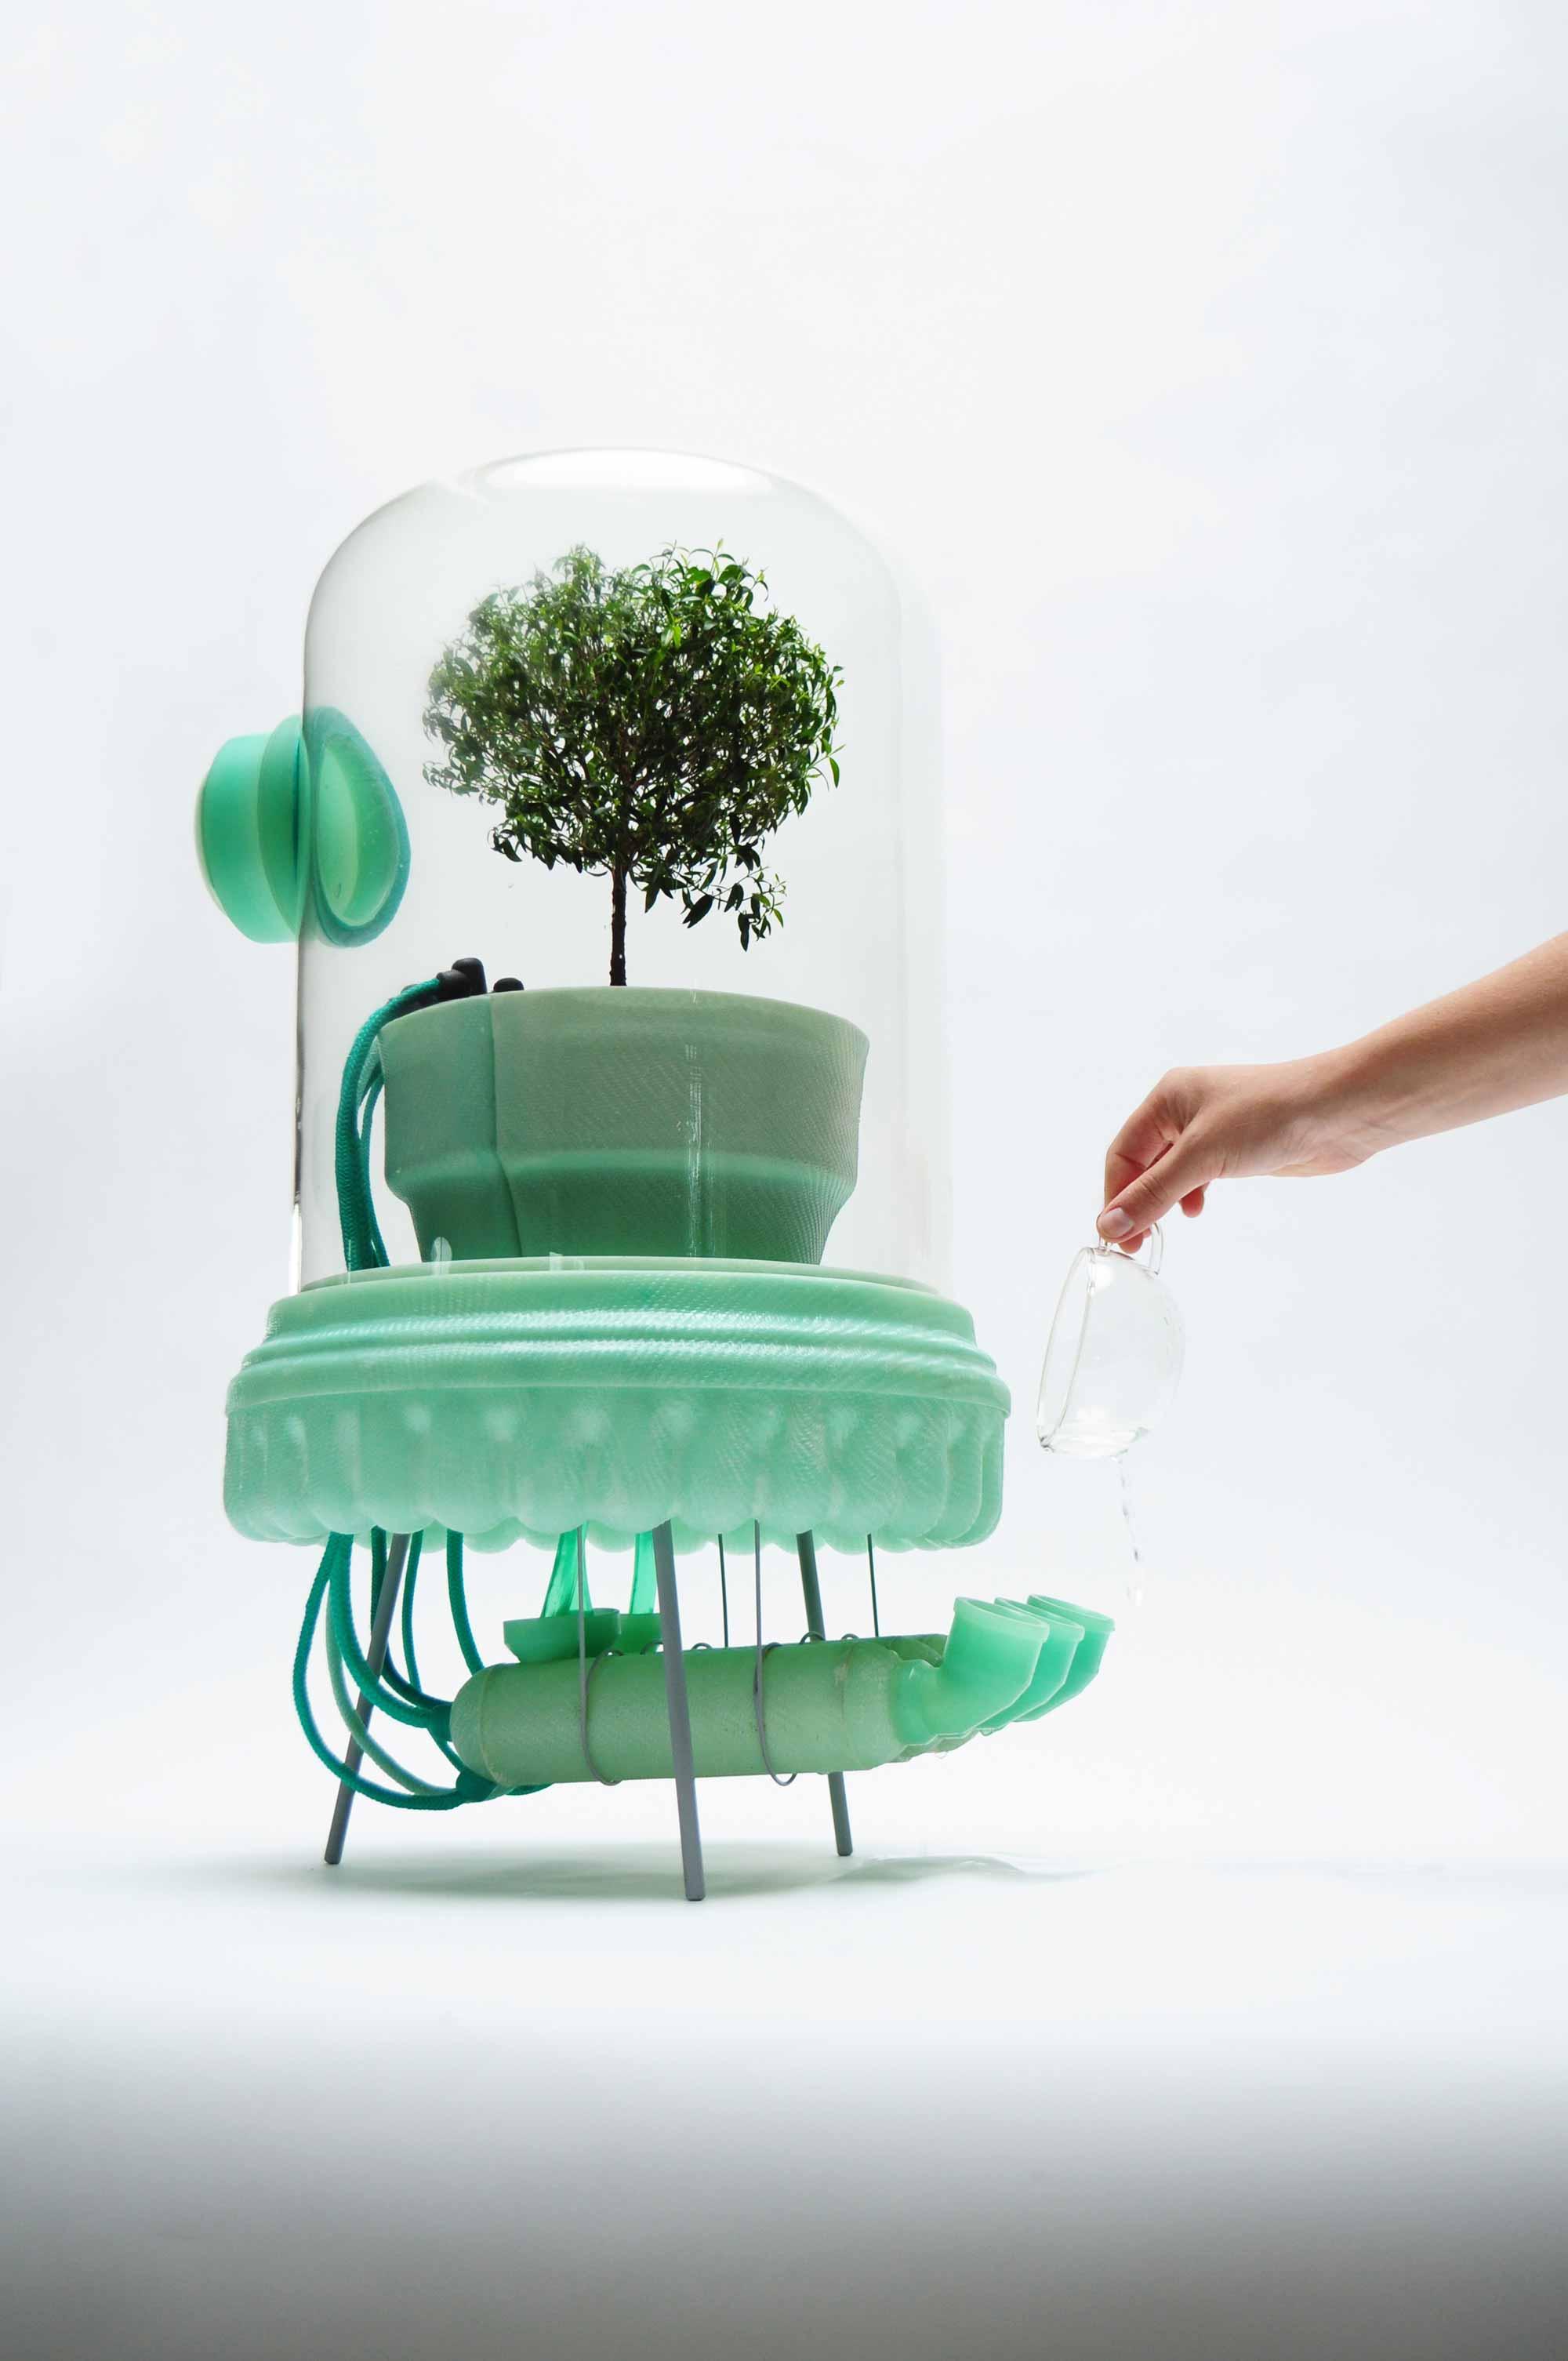 Duurzaam designkwartier | Juliette Warmerhoven | vtwonen.nl